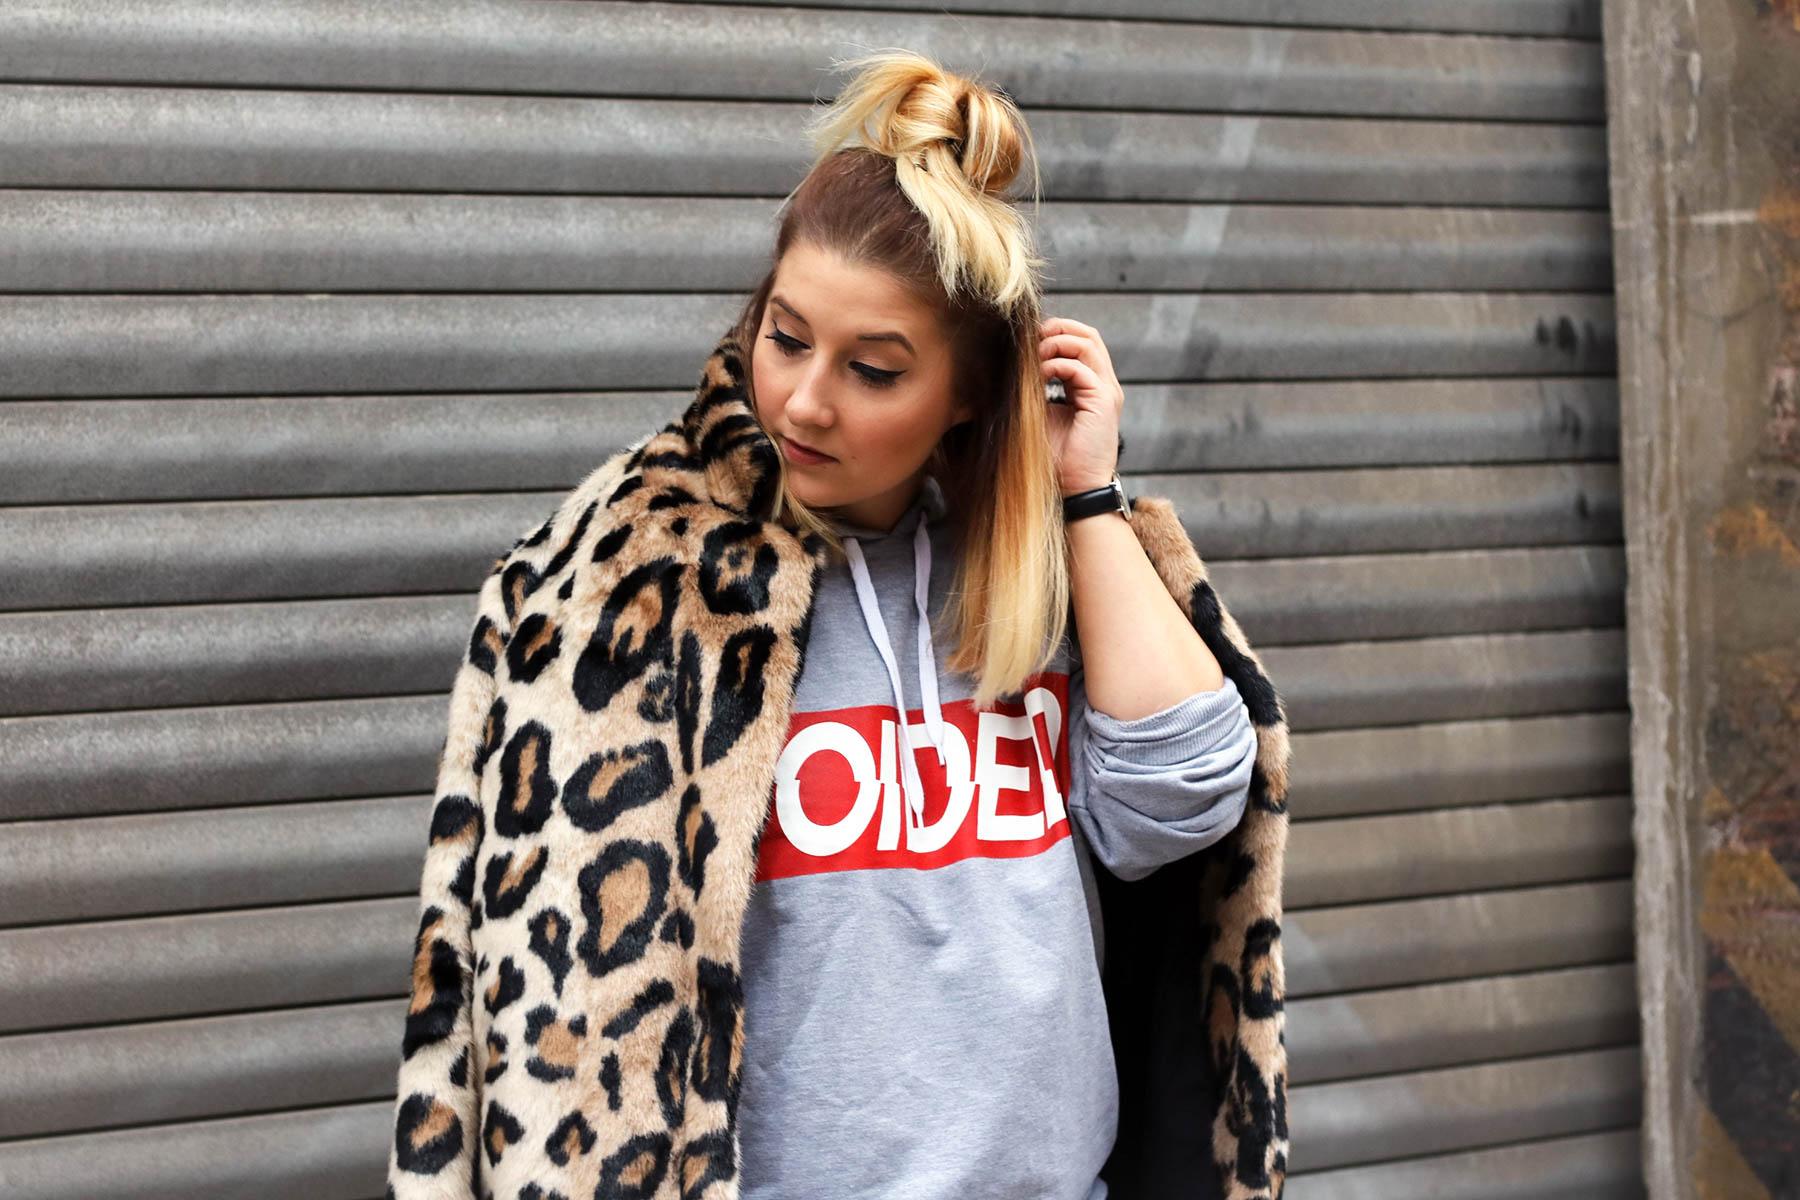 outfit-modeblog-fashionblog-fashionpassionlove-leo-mantel-trend-mantel-winter-sneaker-adidas32 (1 von 1)